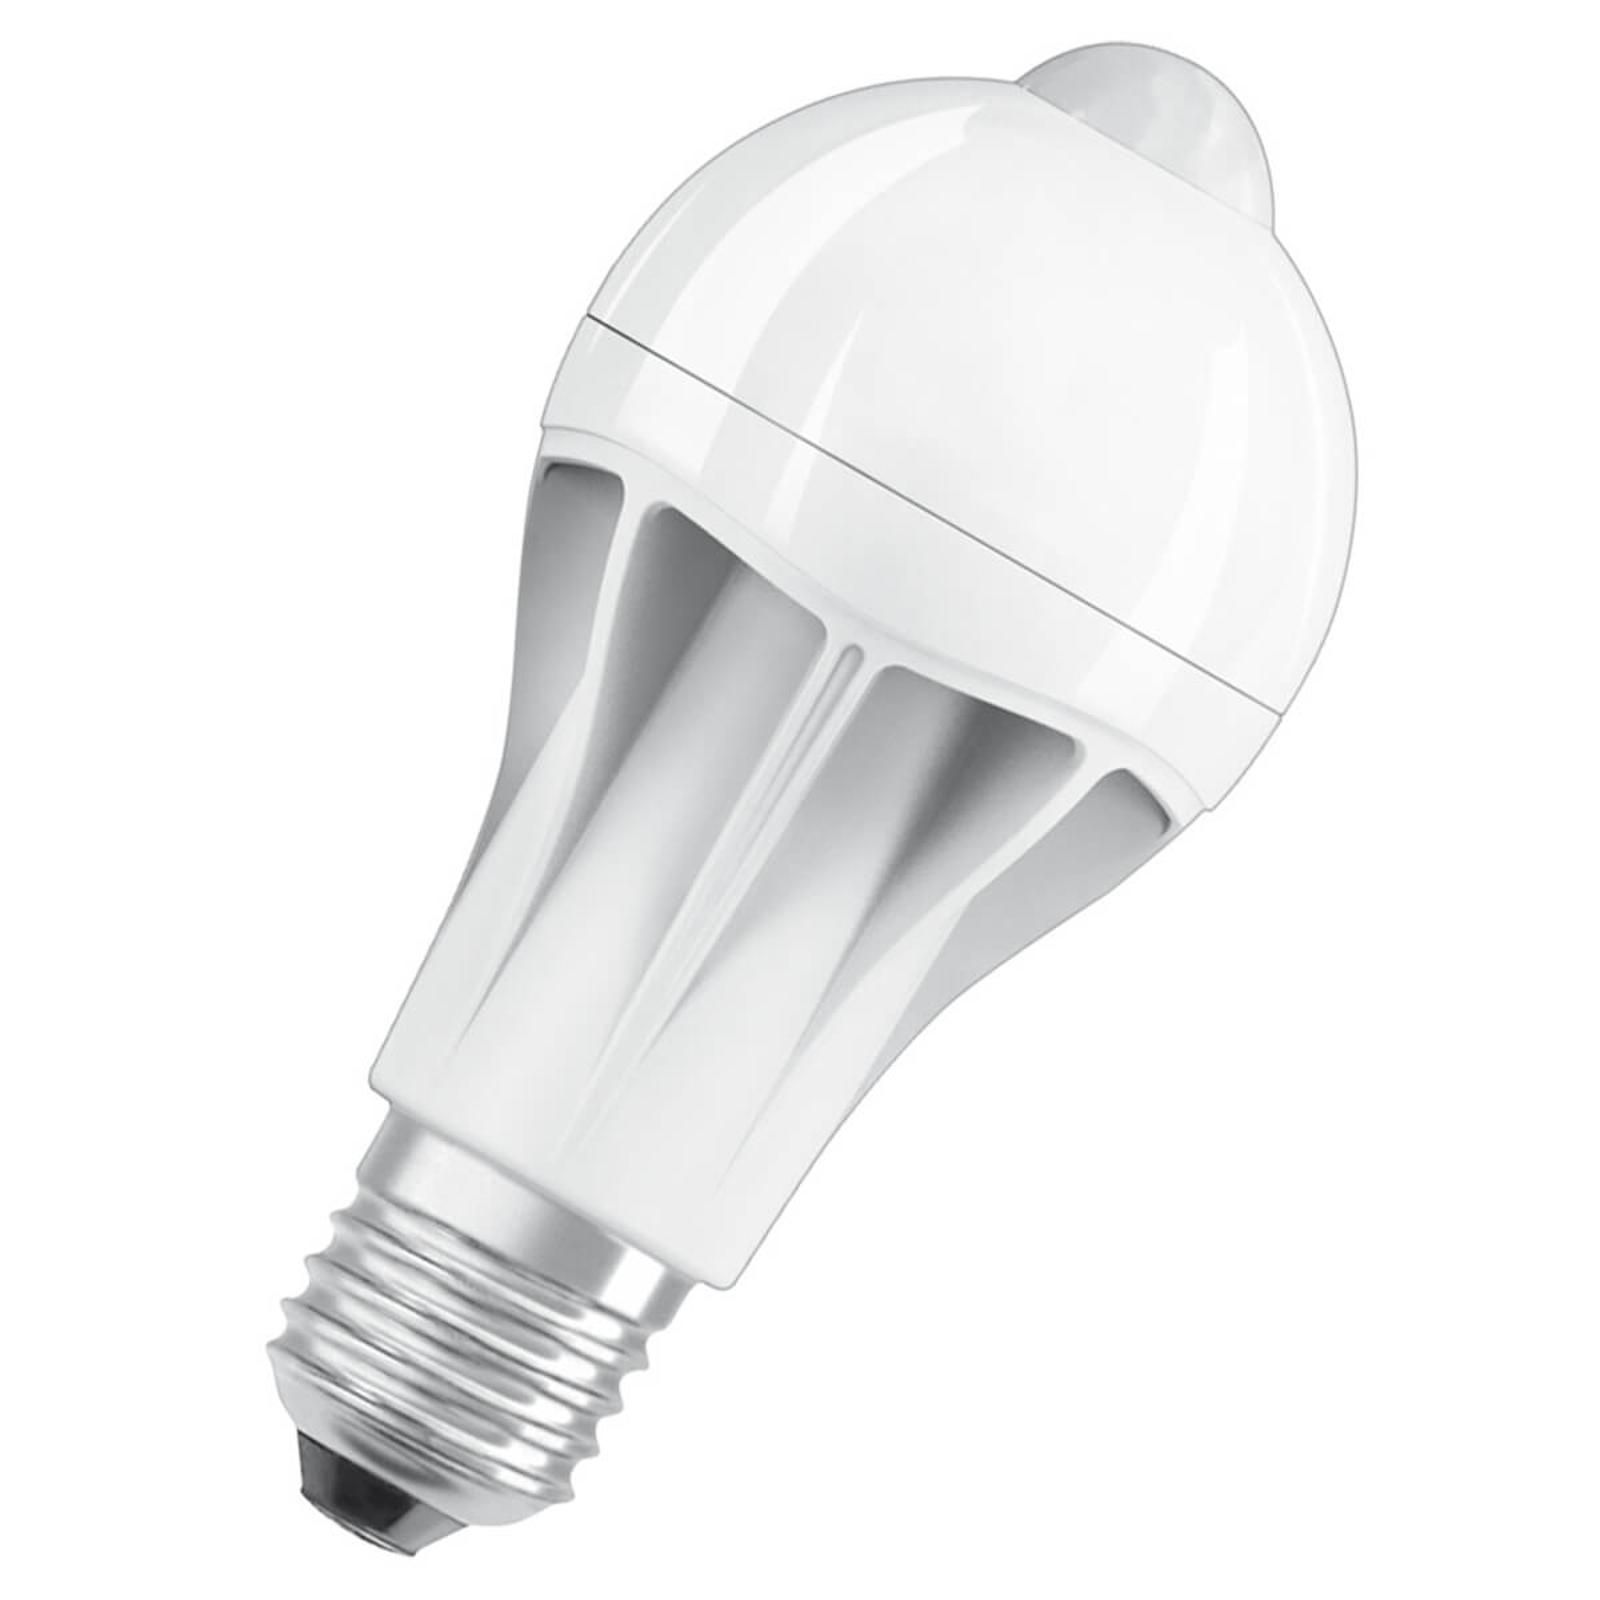 LED-lamppu E27 11W 2 700 K liiketunnistimella